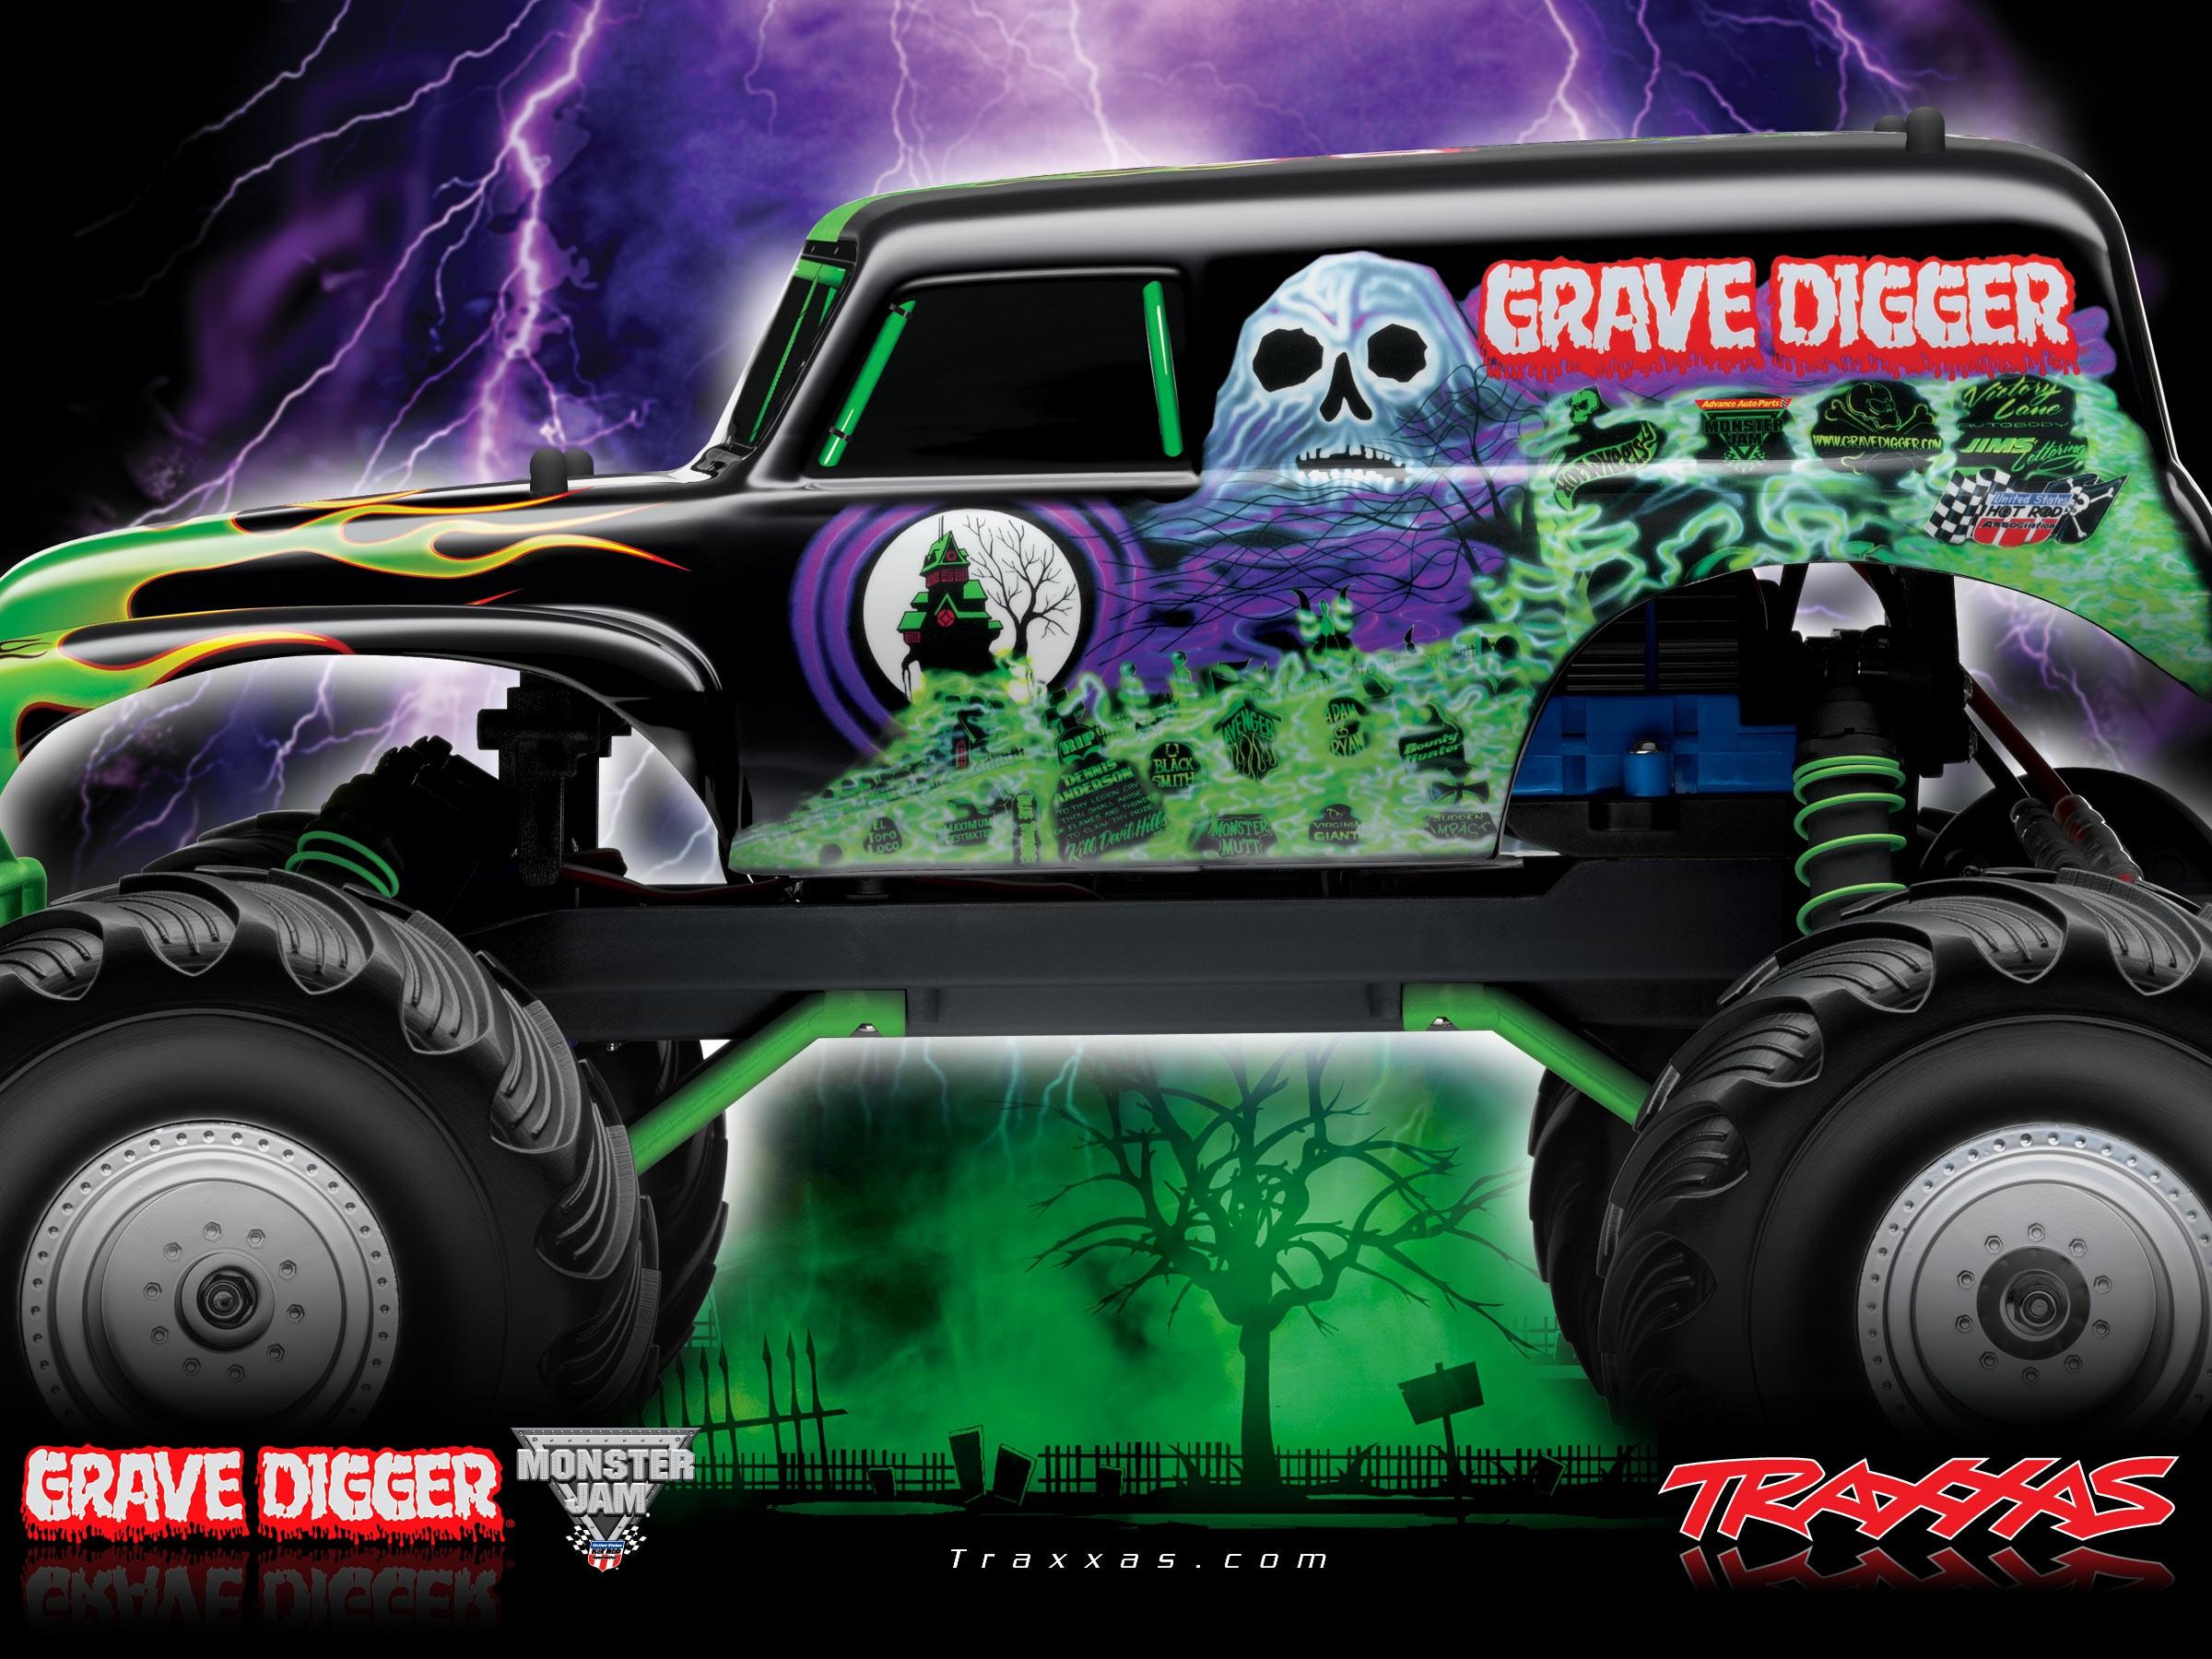 Drawn truck grave digger monster truck Drawing digger Truck truck Maxi